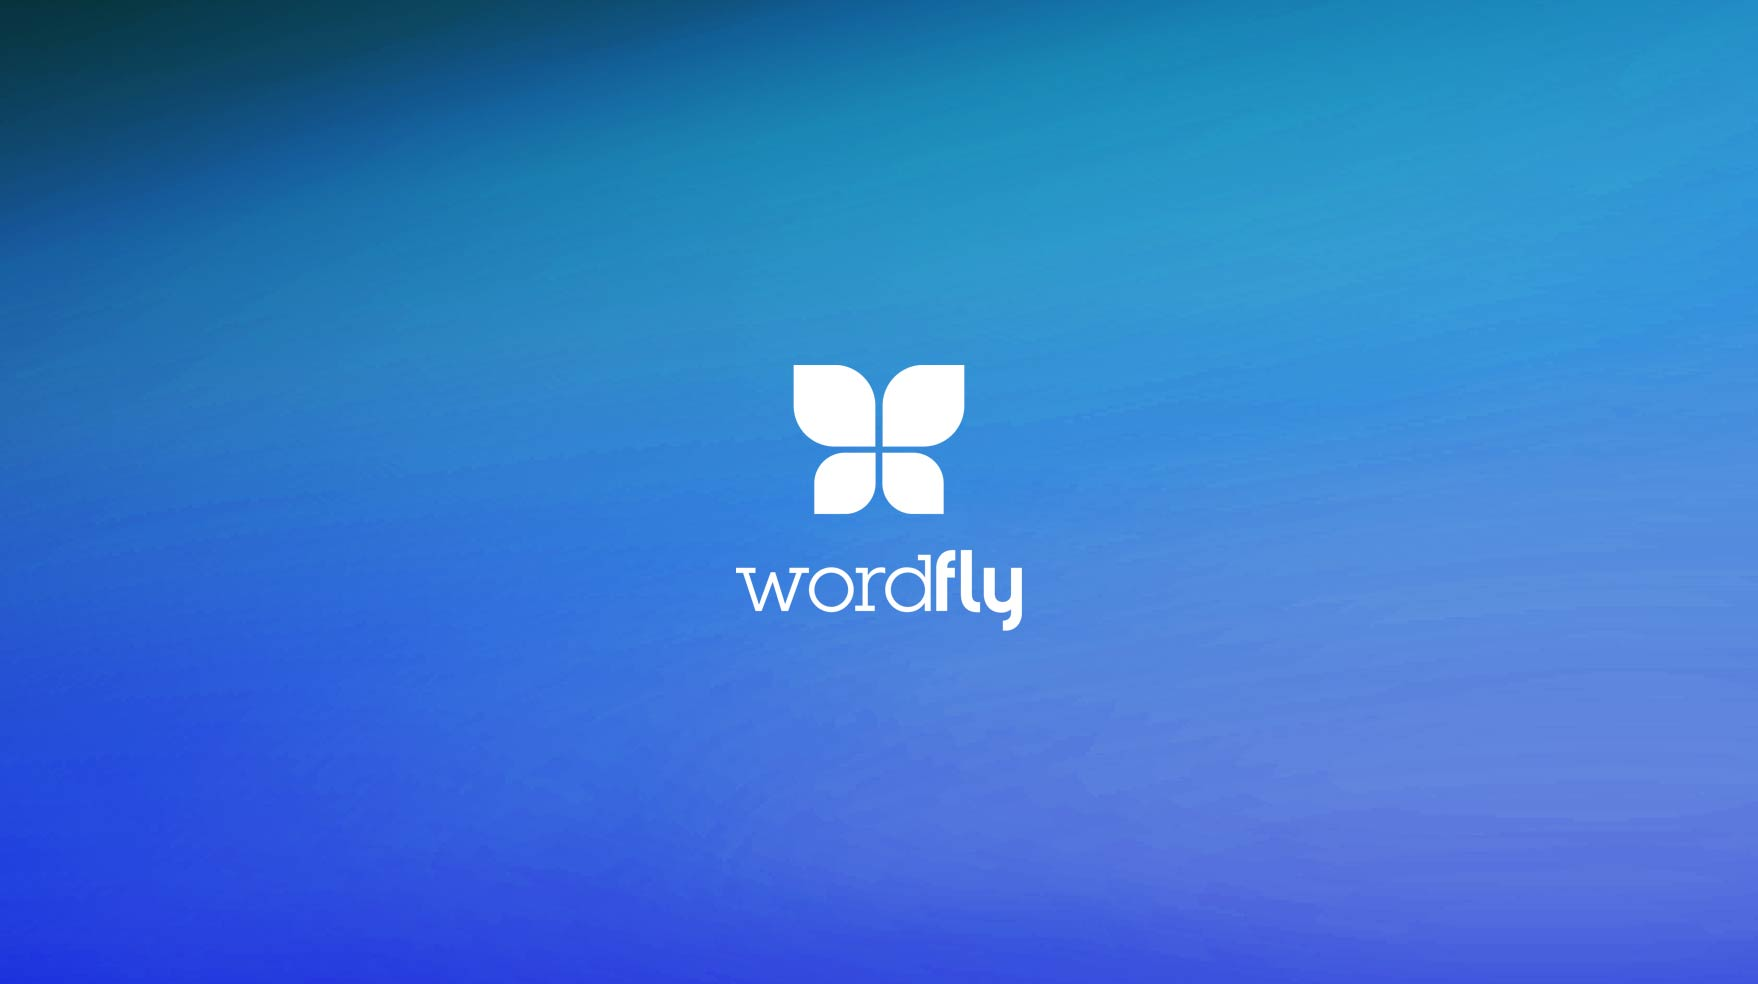 WordFly logo on bright blue gradient